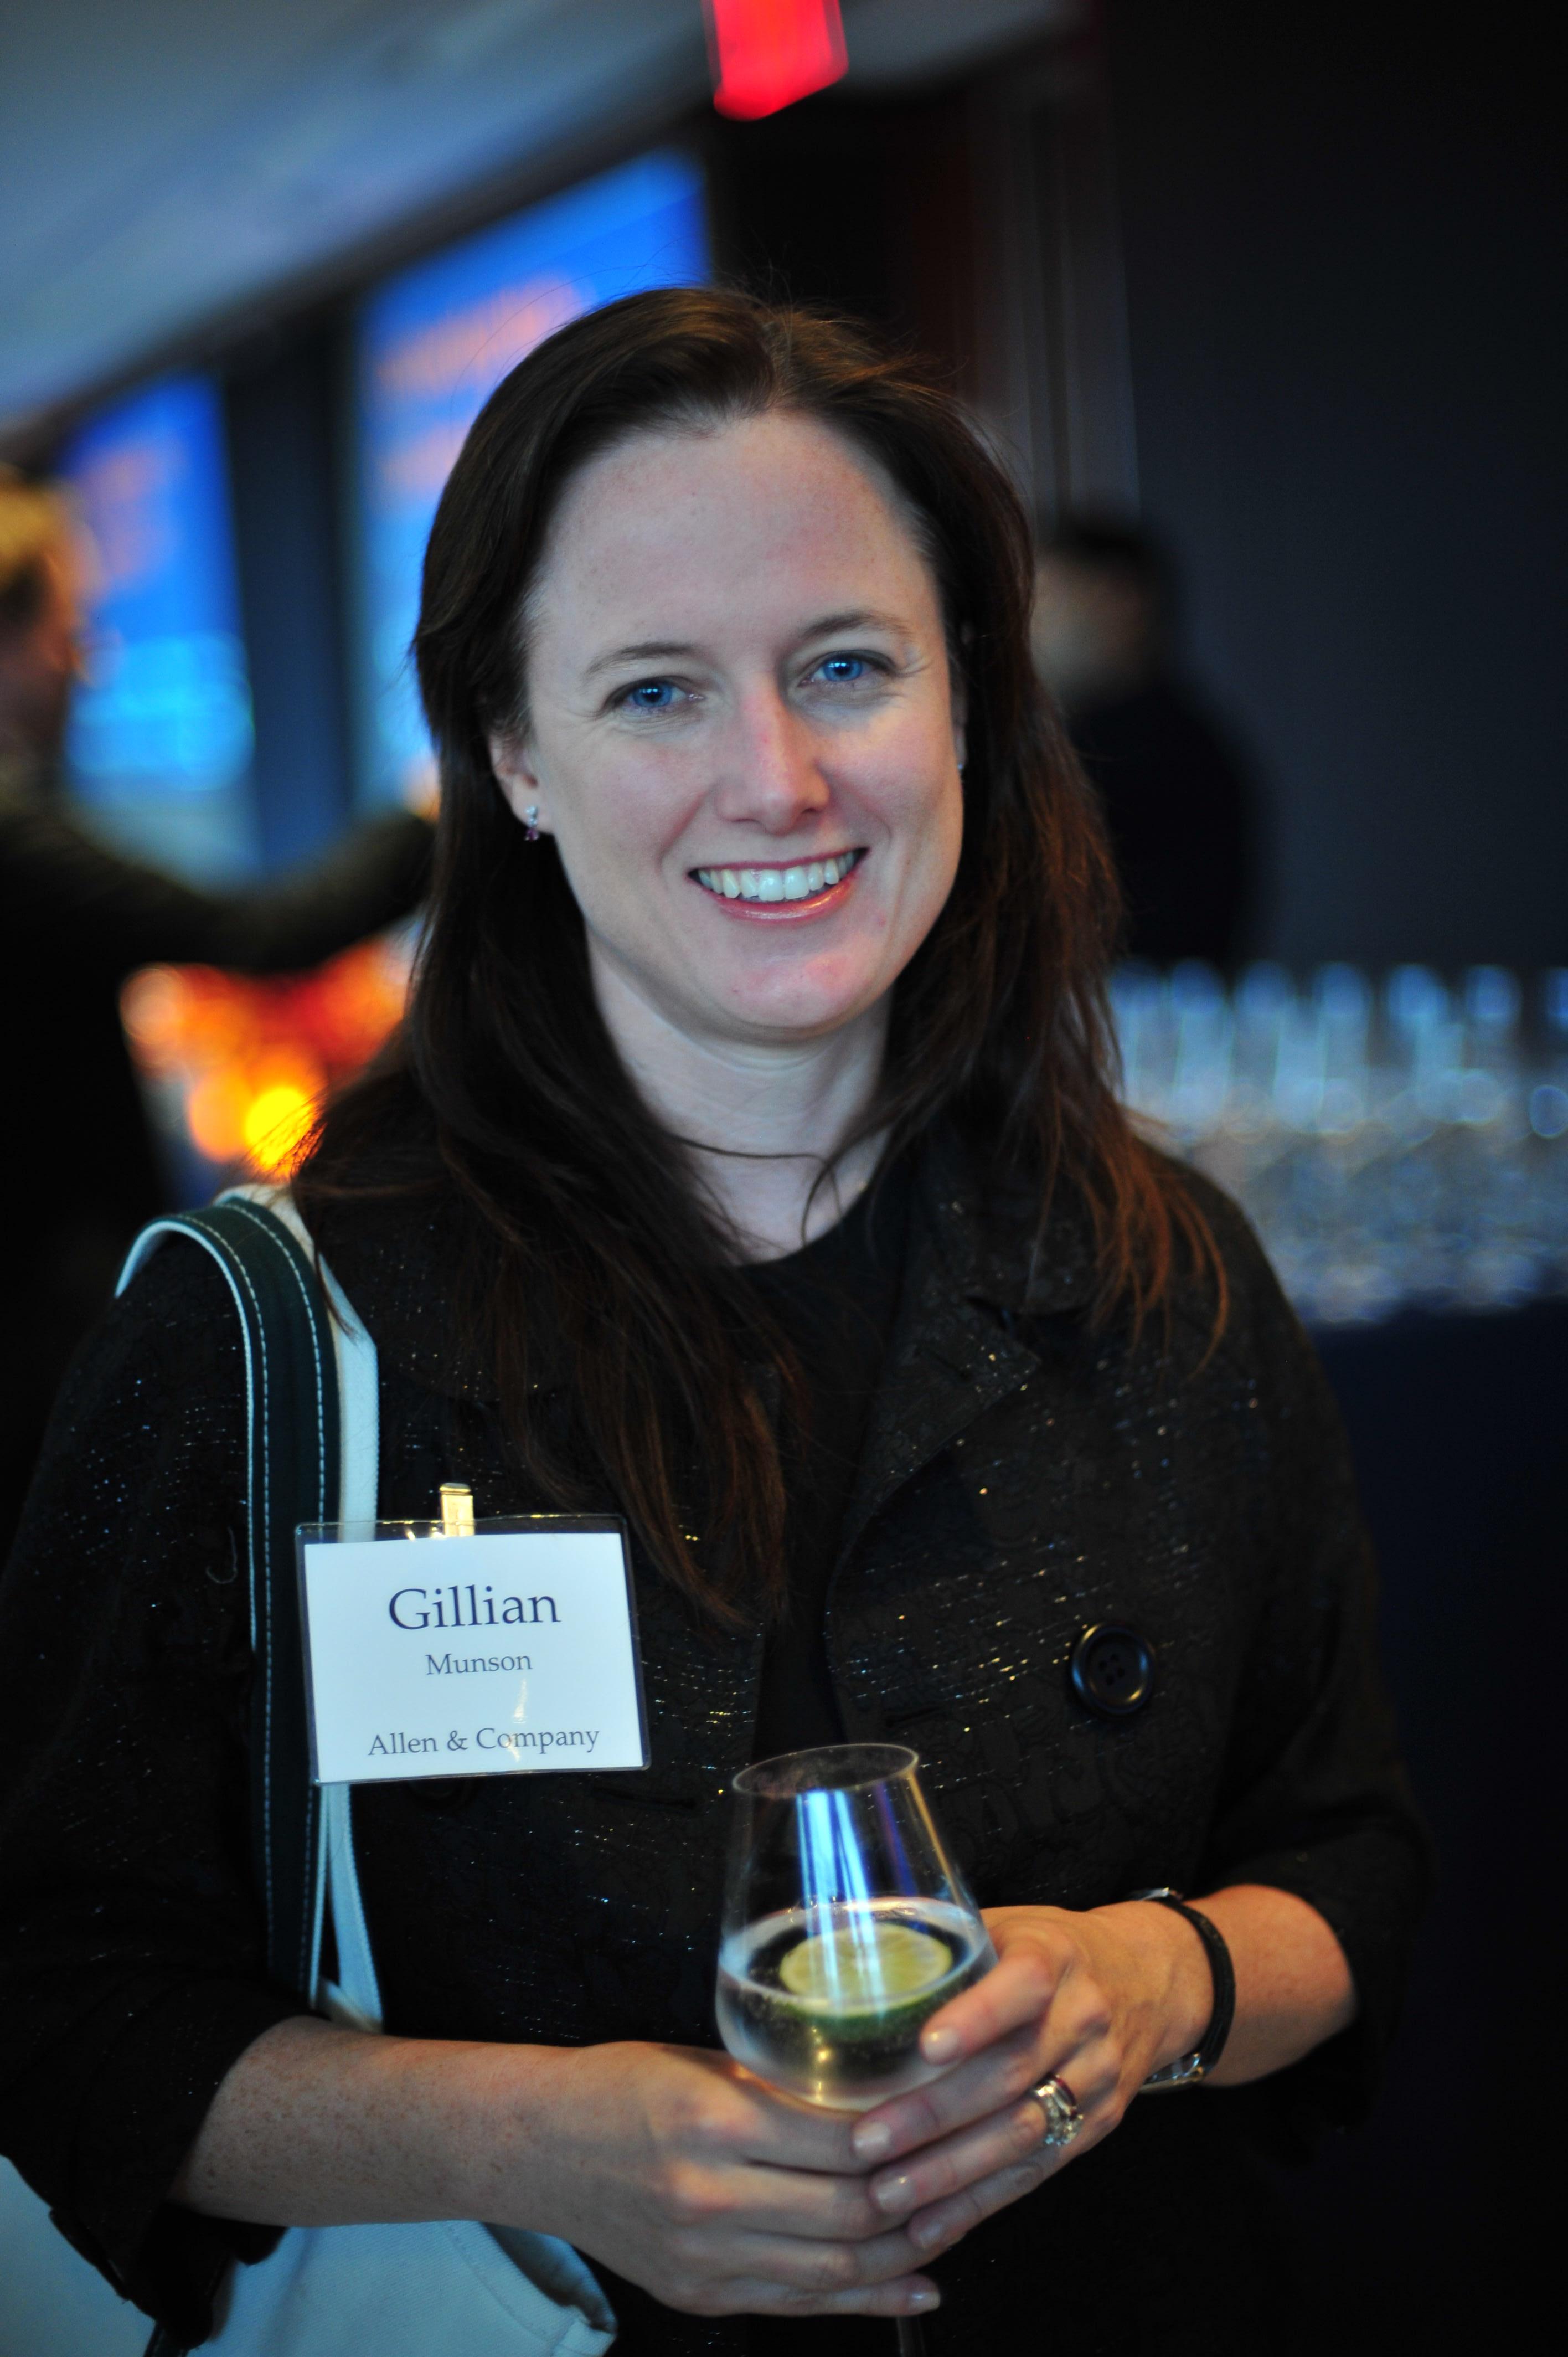 Gillian Munson